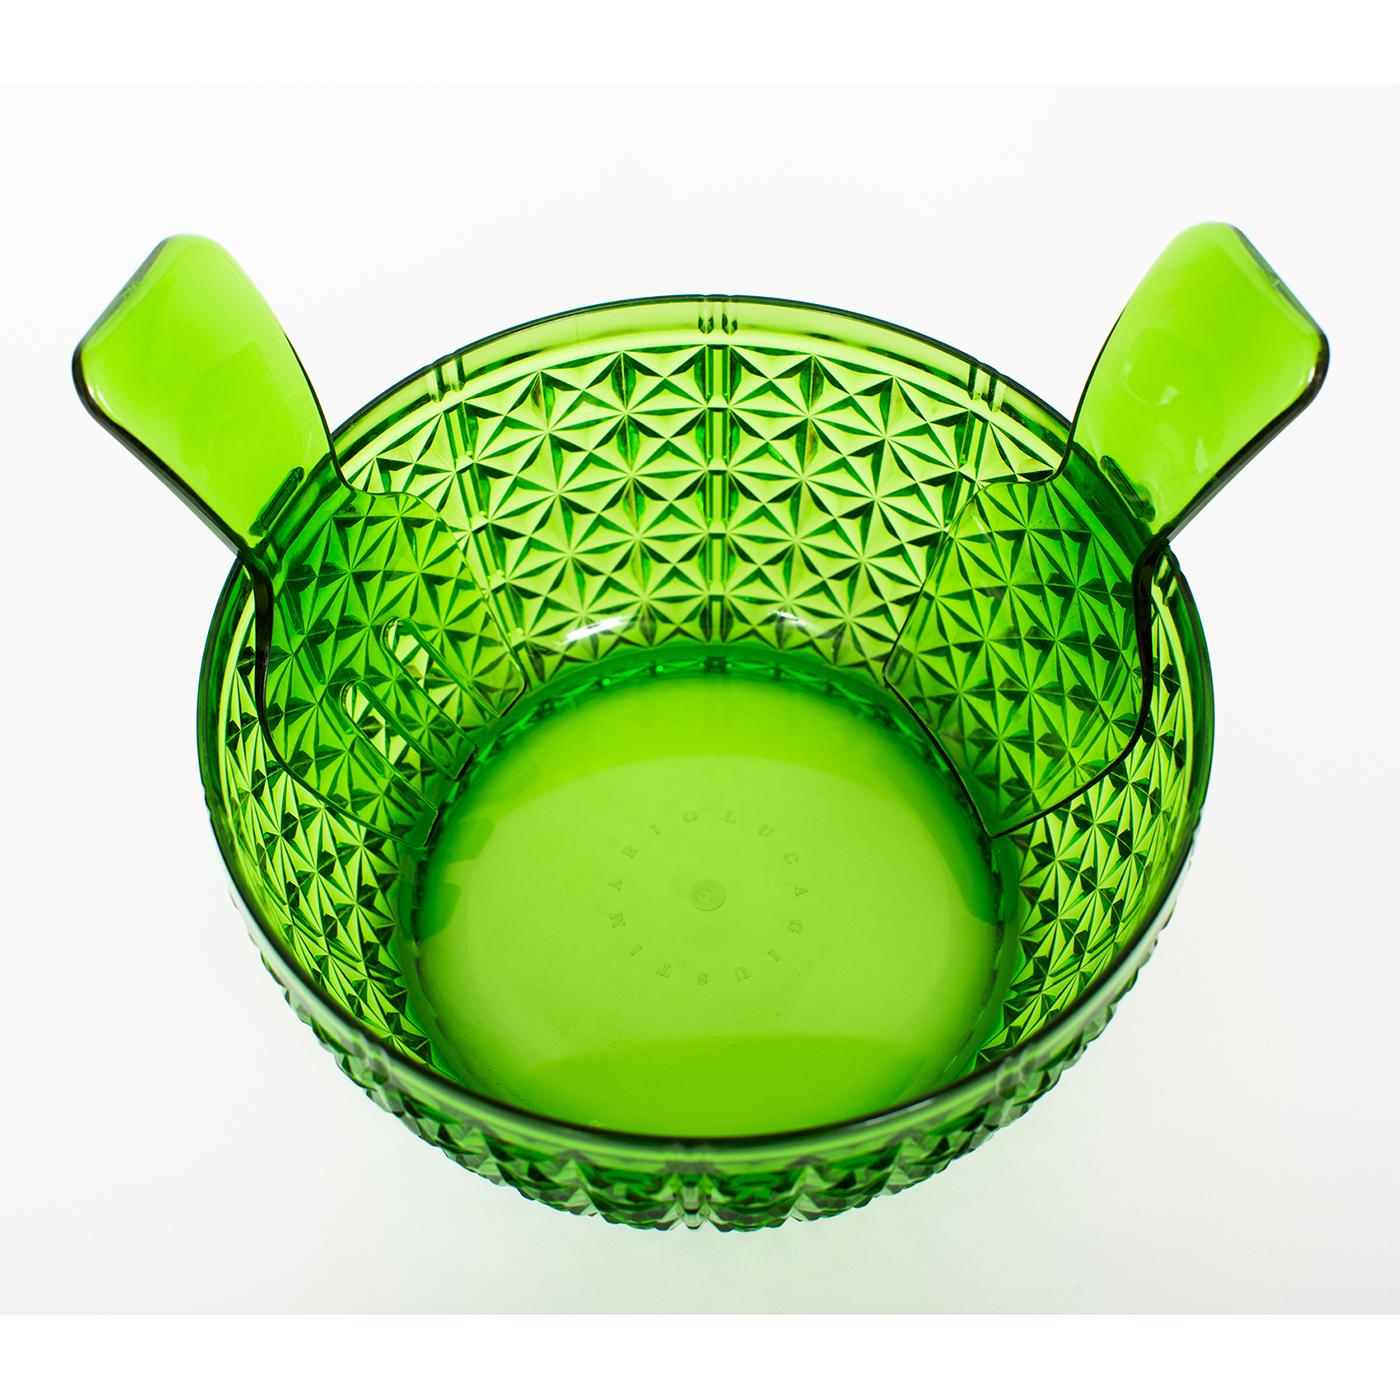 The Churchill Salad Bowl